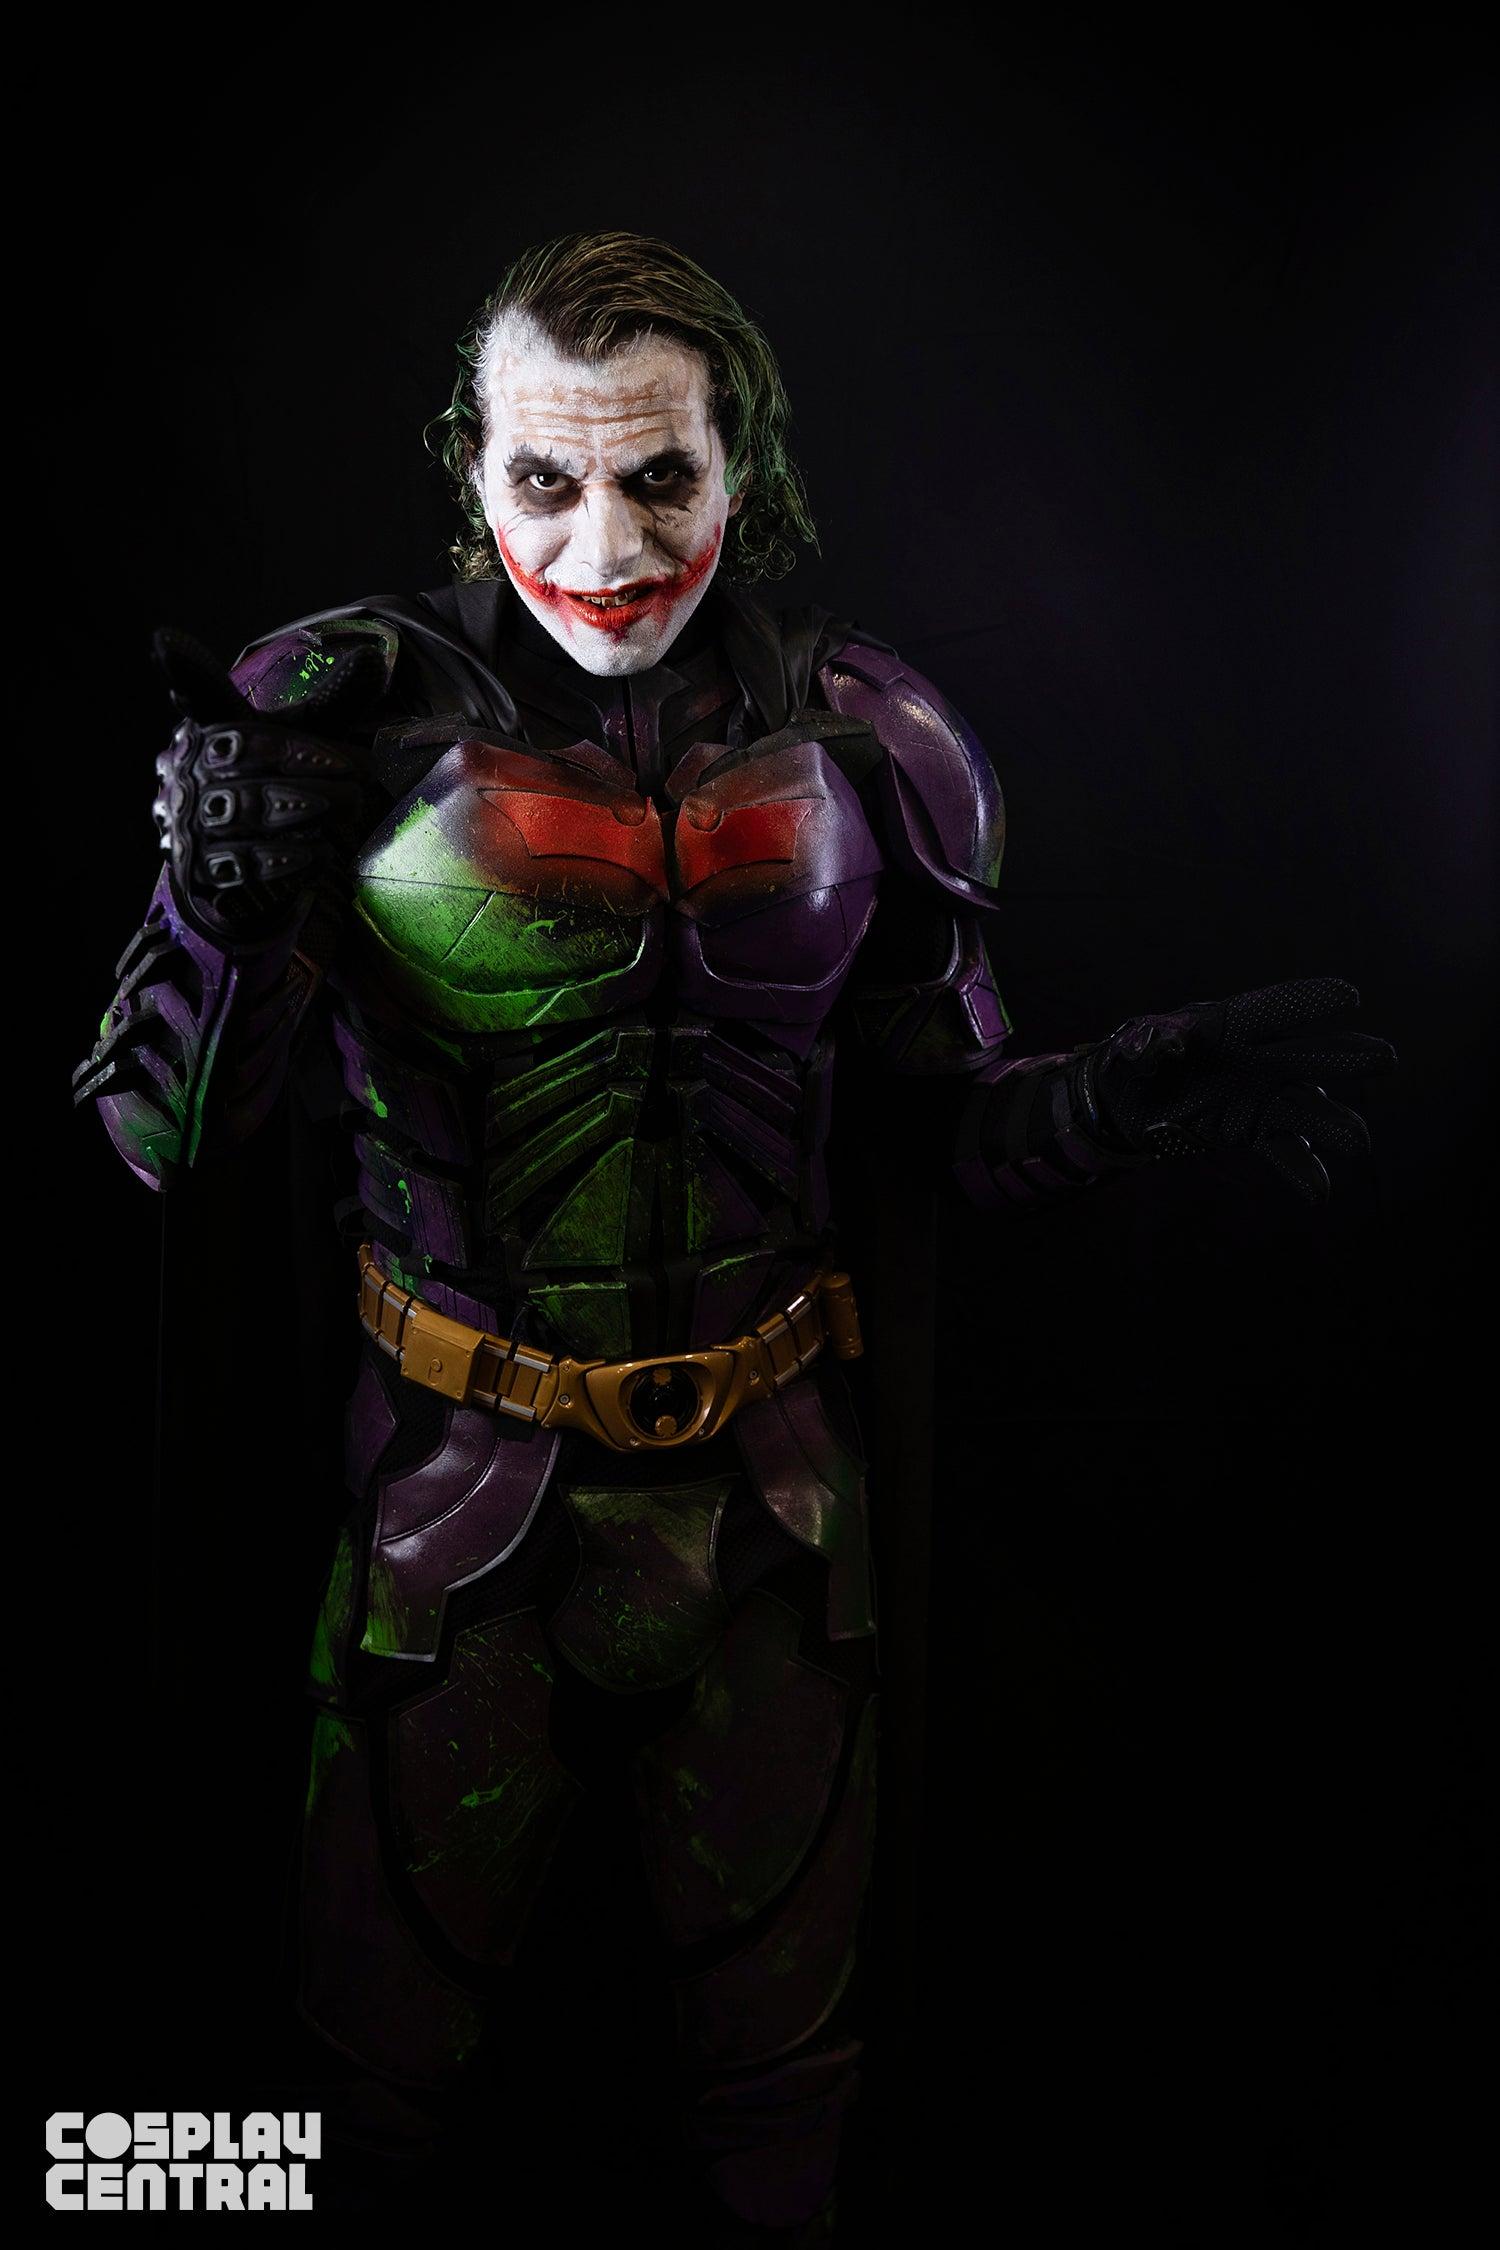 The BatJoker at New York Comic Con